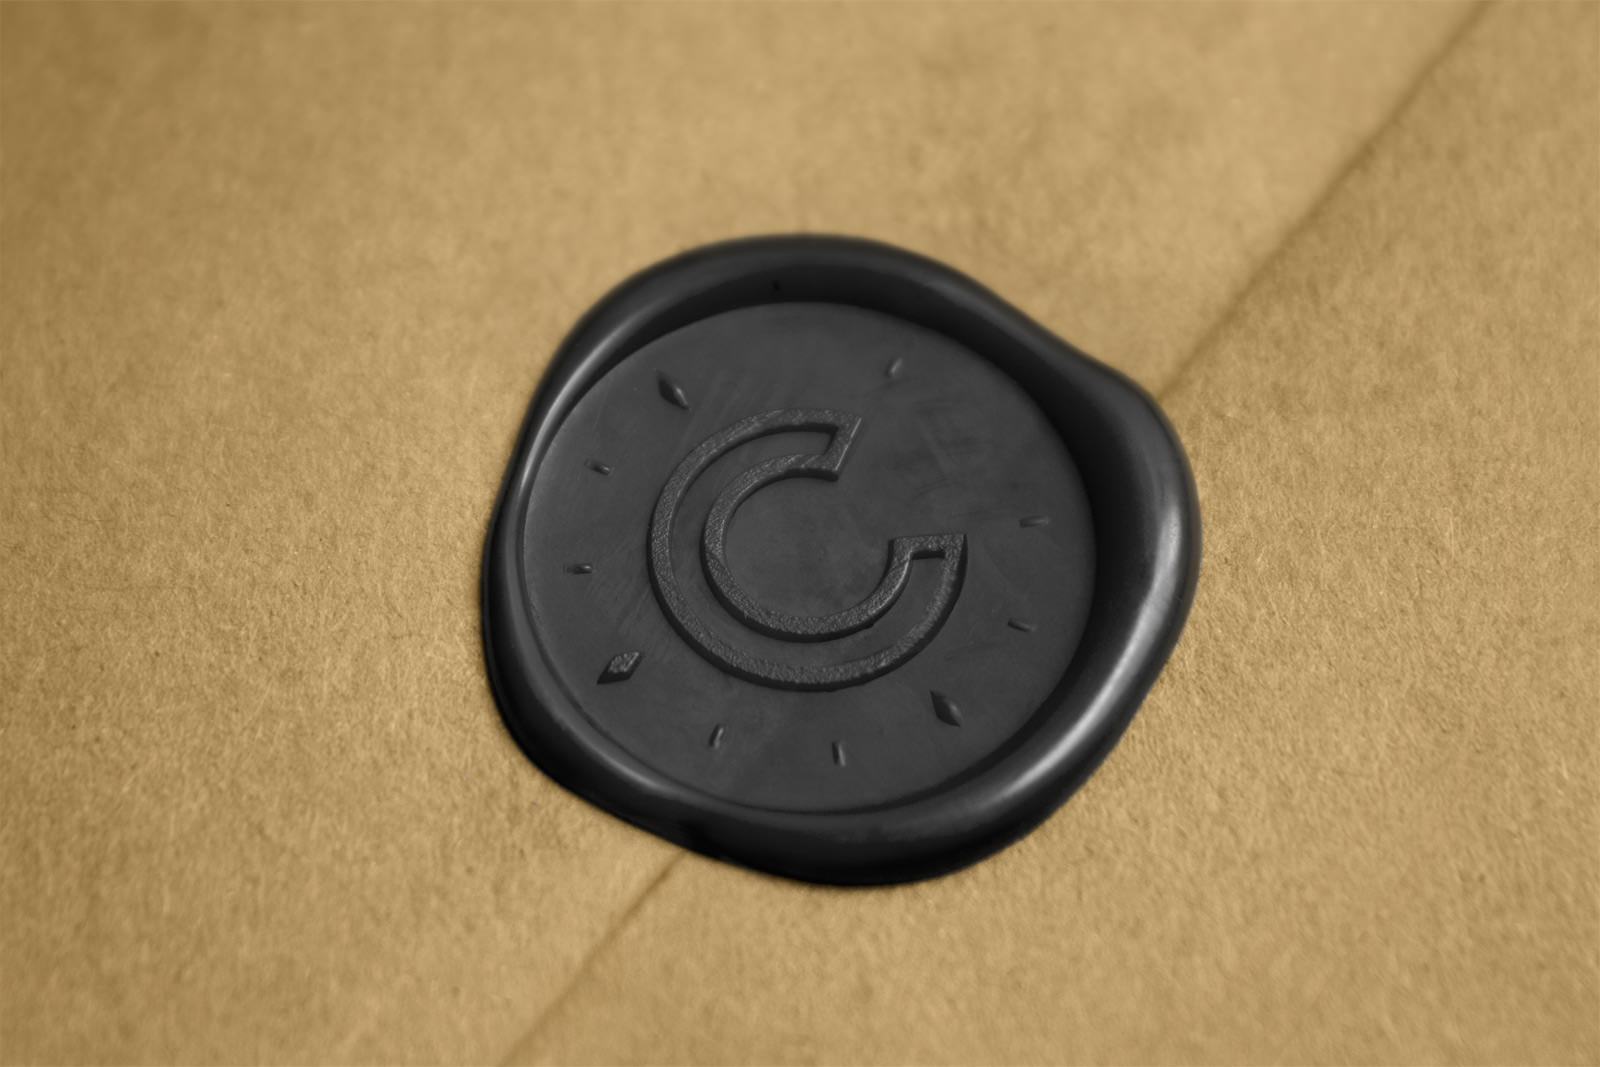 Figure-Jeremy-Hall-Design-Graphique-Logo-Branding-Image-De-Marque-Cendrillon-Restaurant-Emballage-24.jpg